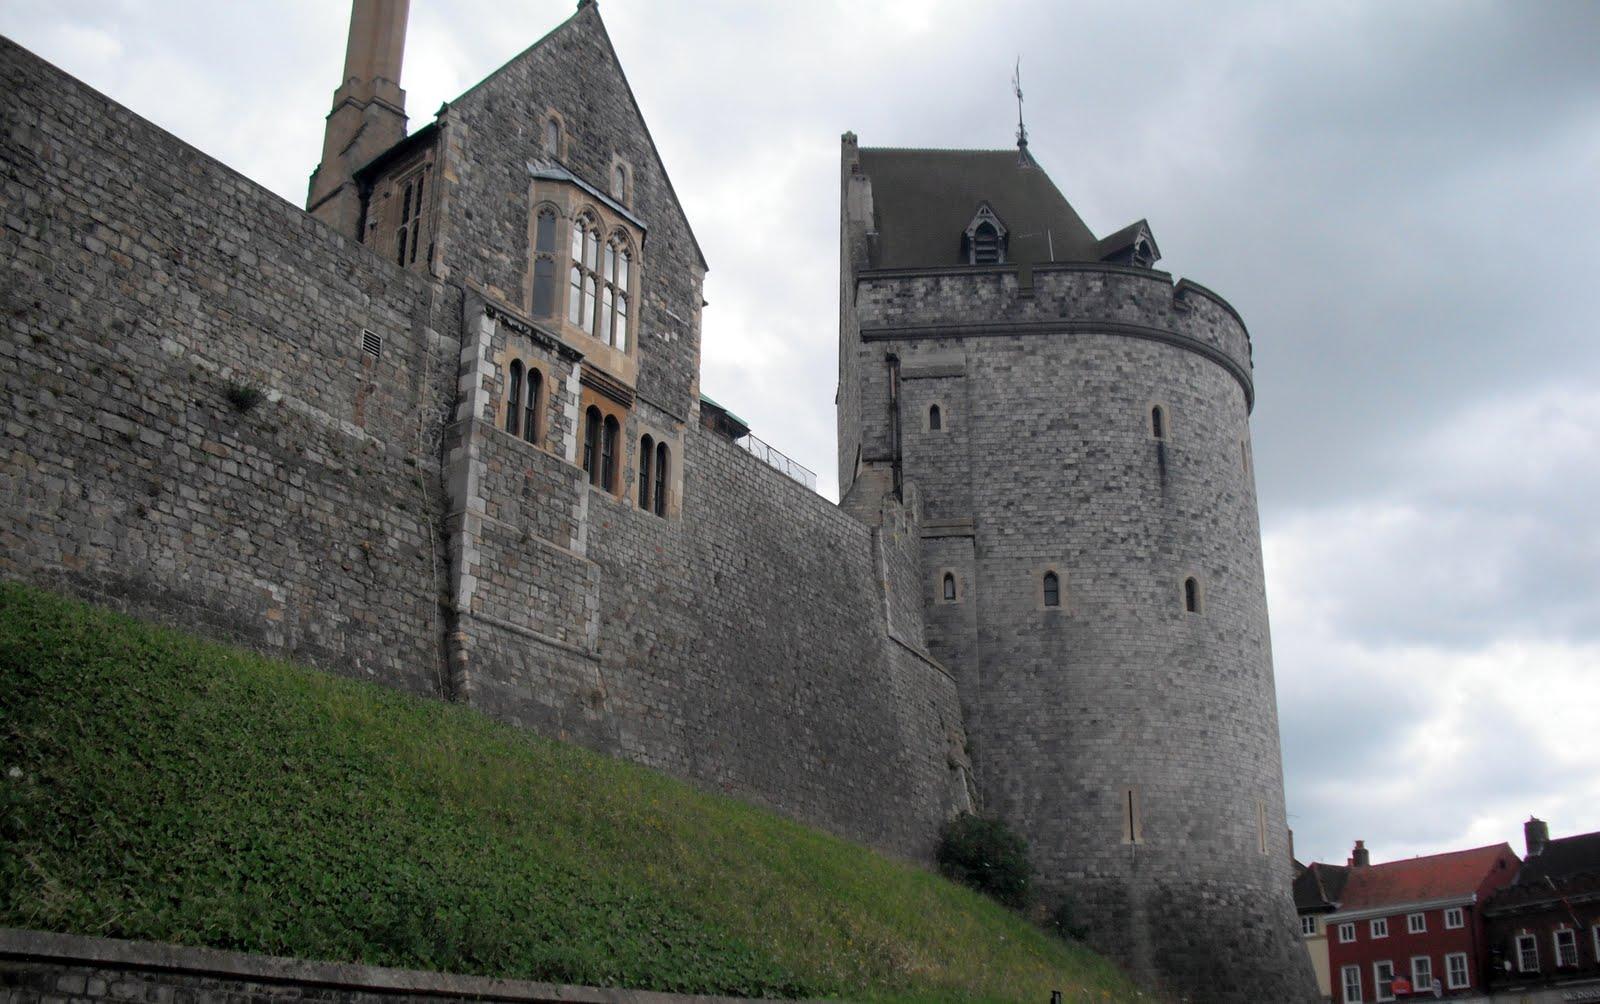 http://2.bp.blogspot.com/-93cBo-61bs0/ThlmqLLDkRI/AAAAAAAAAIA/39zVYF9aEuk/s1600/7-9_Windsor_Castle11.jpg